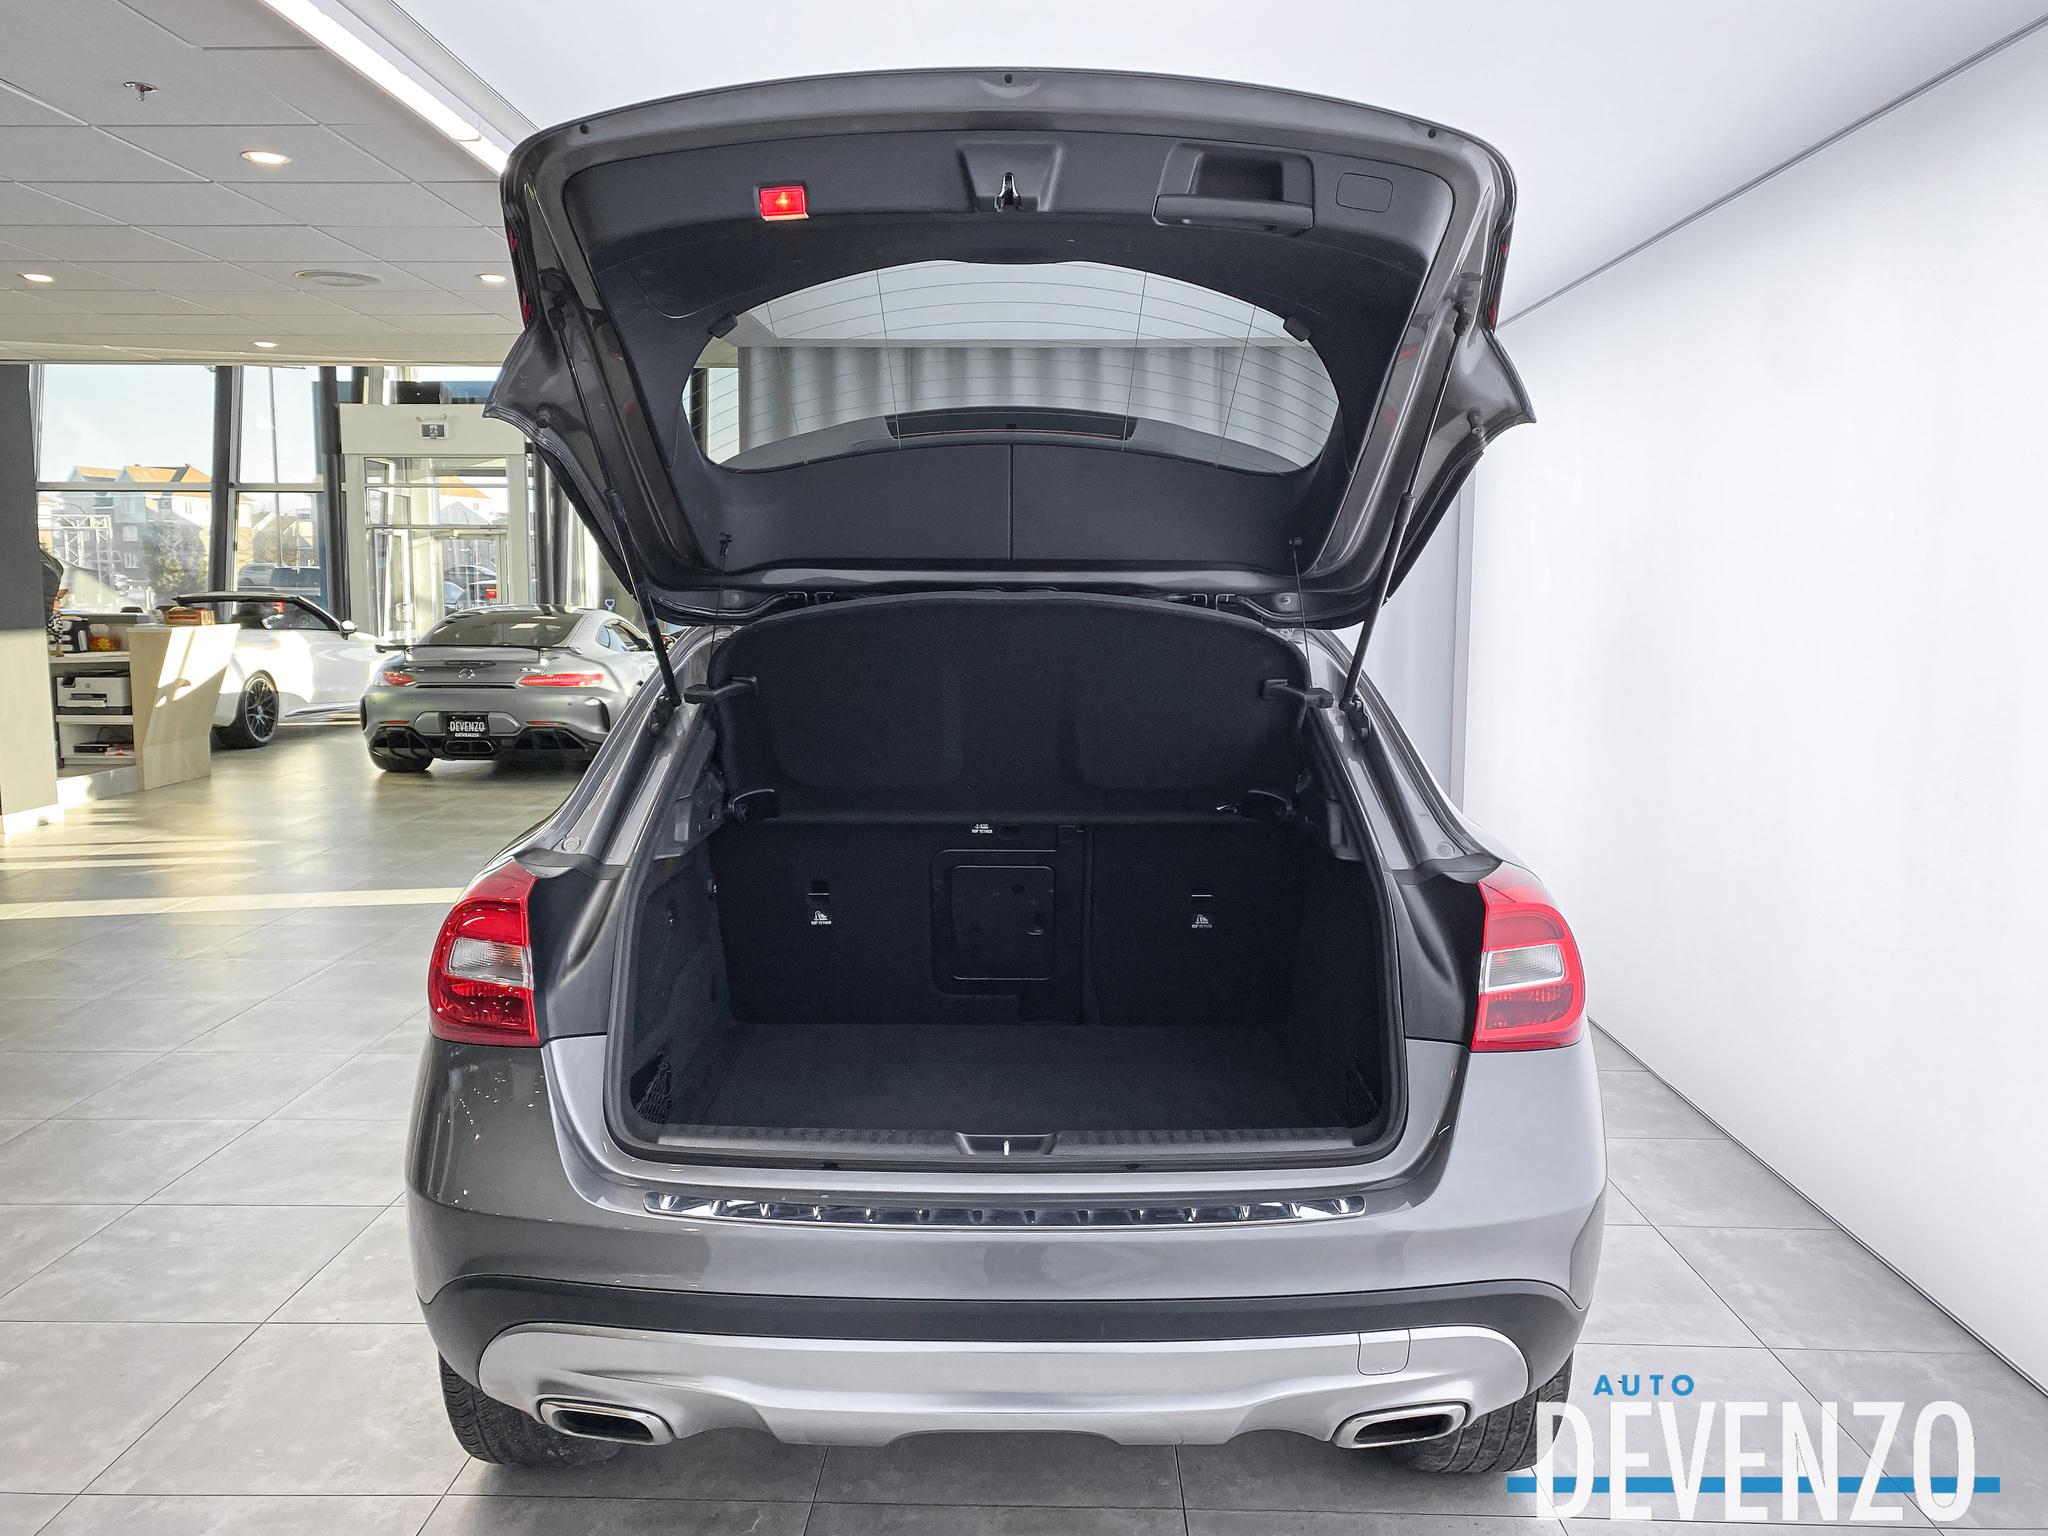 2017 Mercedes-Benz GLA-Class 4MATIC GLA 250 TOIT PANO / GPS NAVI / CAMERA complet